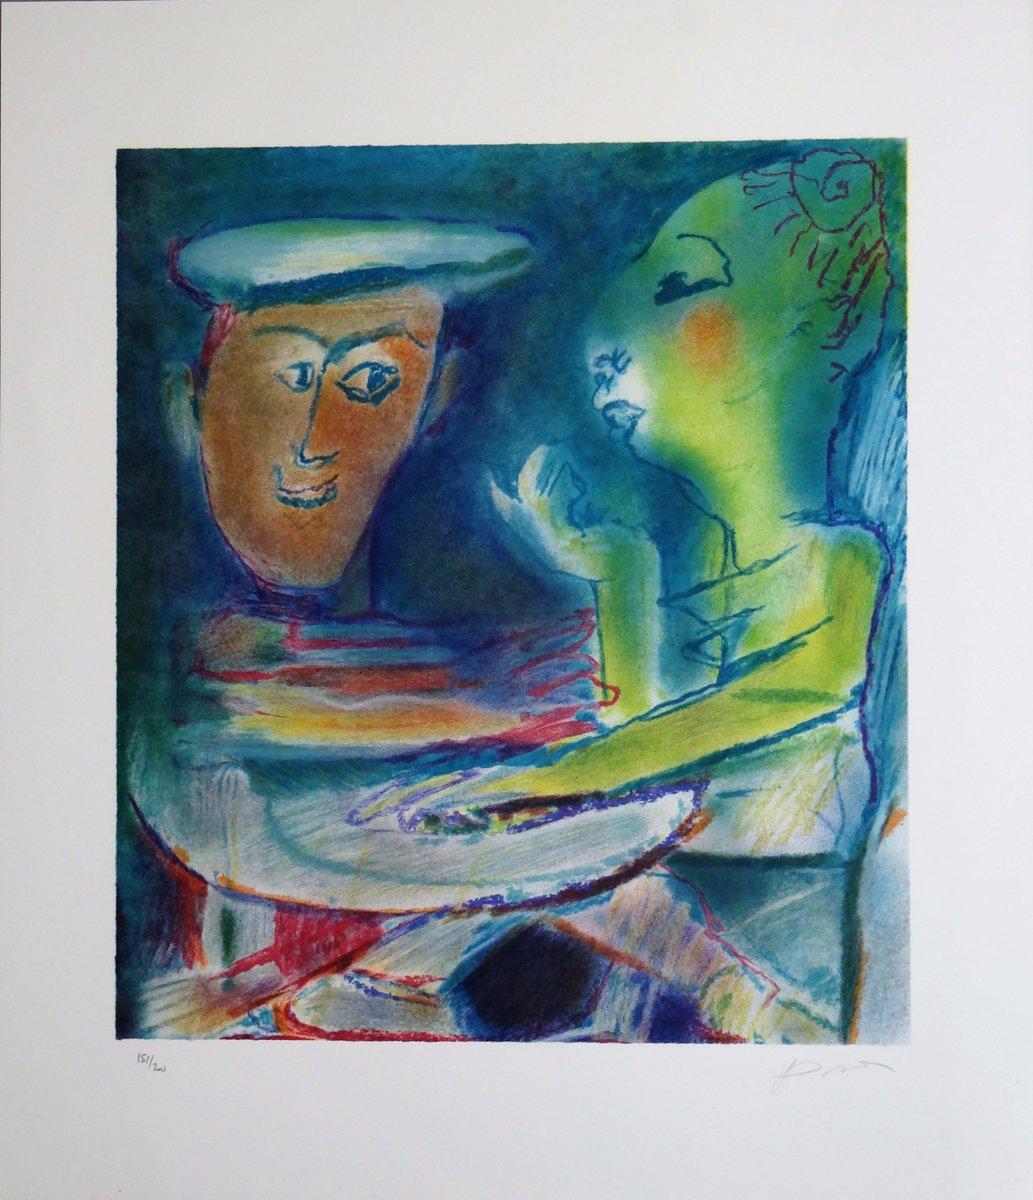 Julio #Pomar original lithograph #giftideas  #Romantic  http:// etsy.me/2zwRwuY  &nbsp;   @flyrts  #WomenInMotion  #atsocialmedia #bestofetsy #art #homedecor #TintegrityT #etsyspecialt #A4team<br>http://pic.twitter.com/EMOboAikph